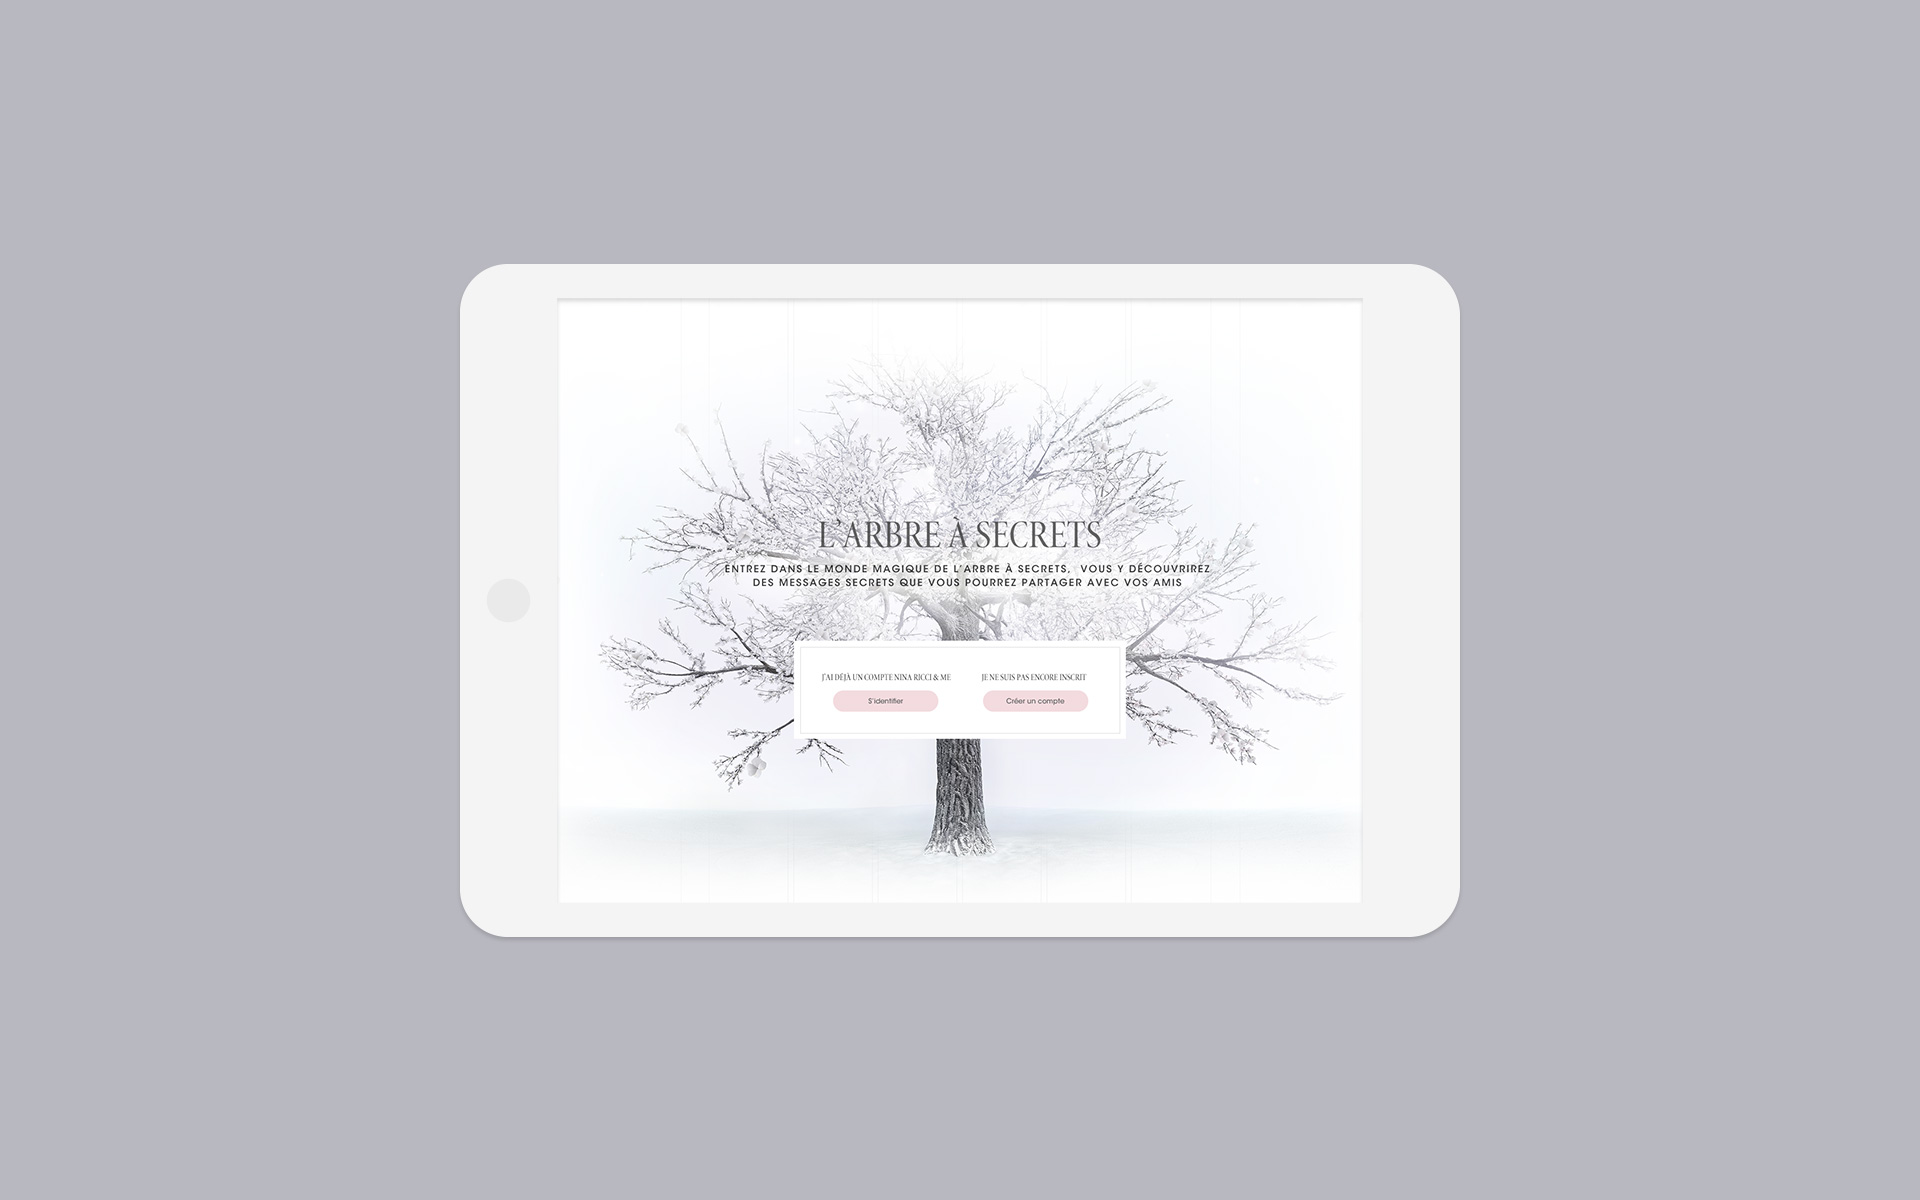 helene-chataigner-nina-web-design-screen-03-big